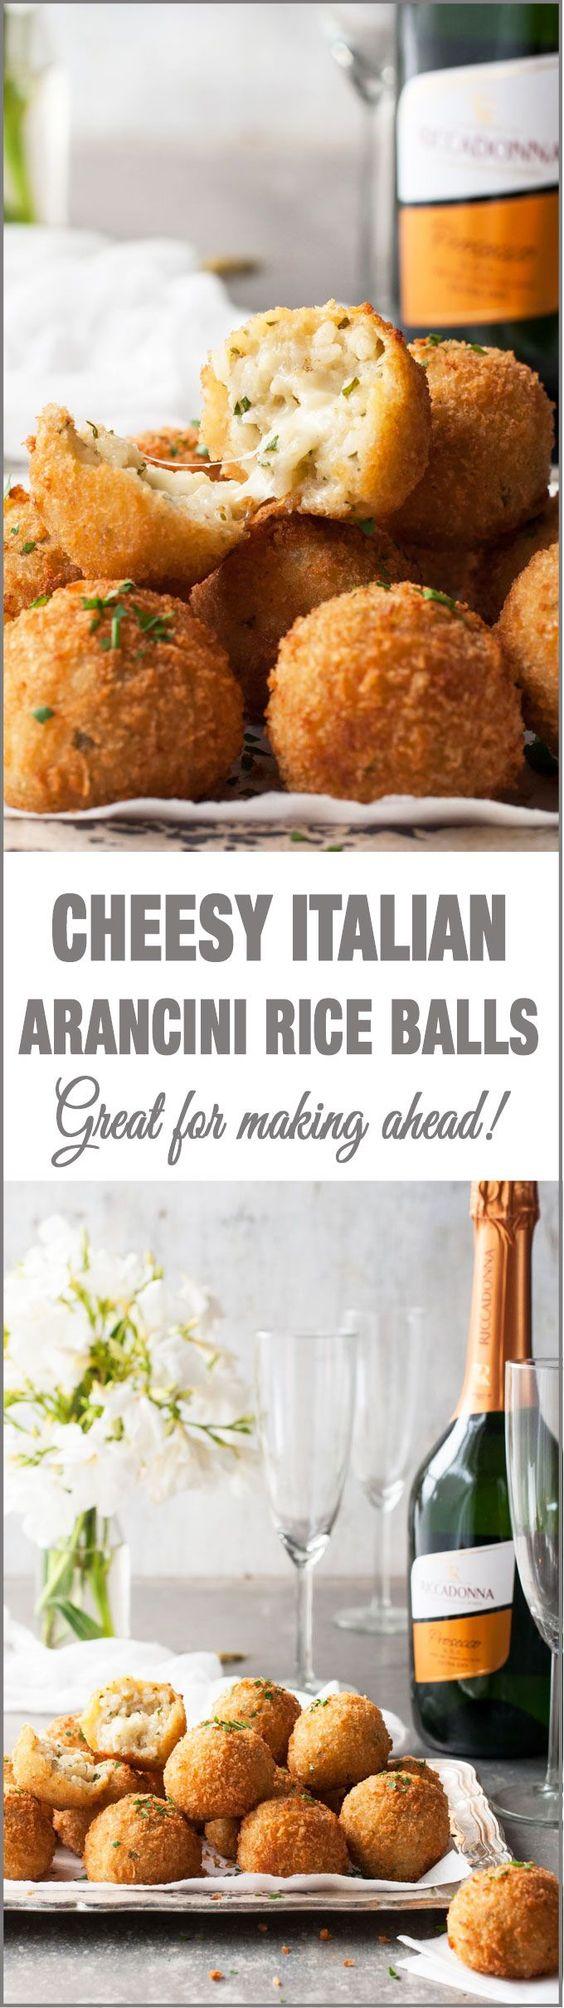 Cheesy Italian Arancini Rice Balls - Sensational for making ahead!